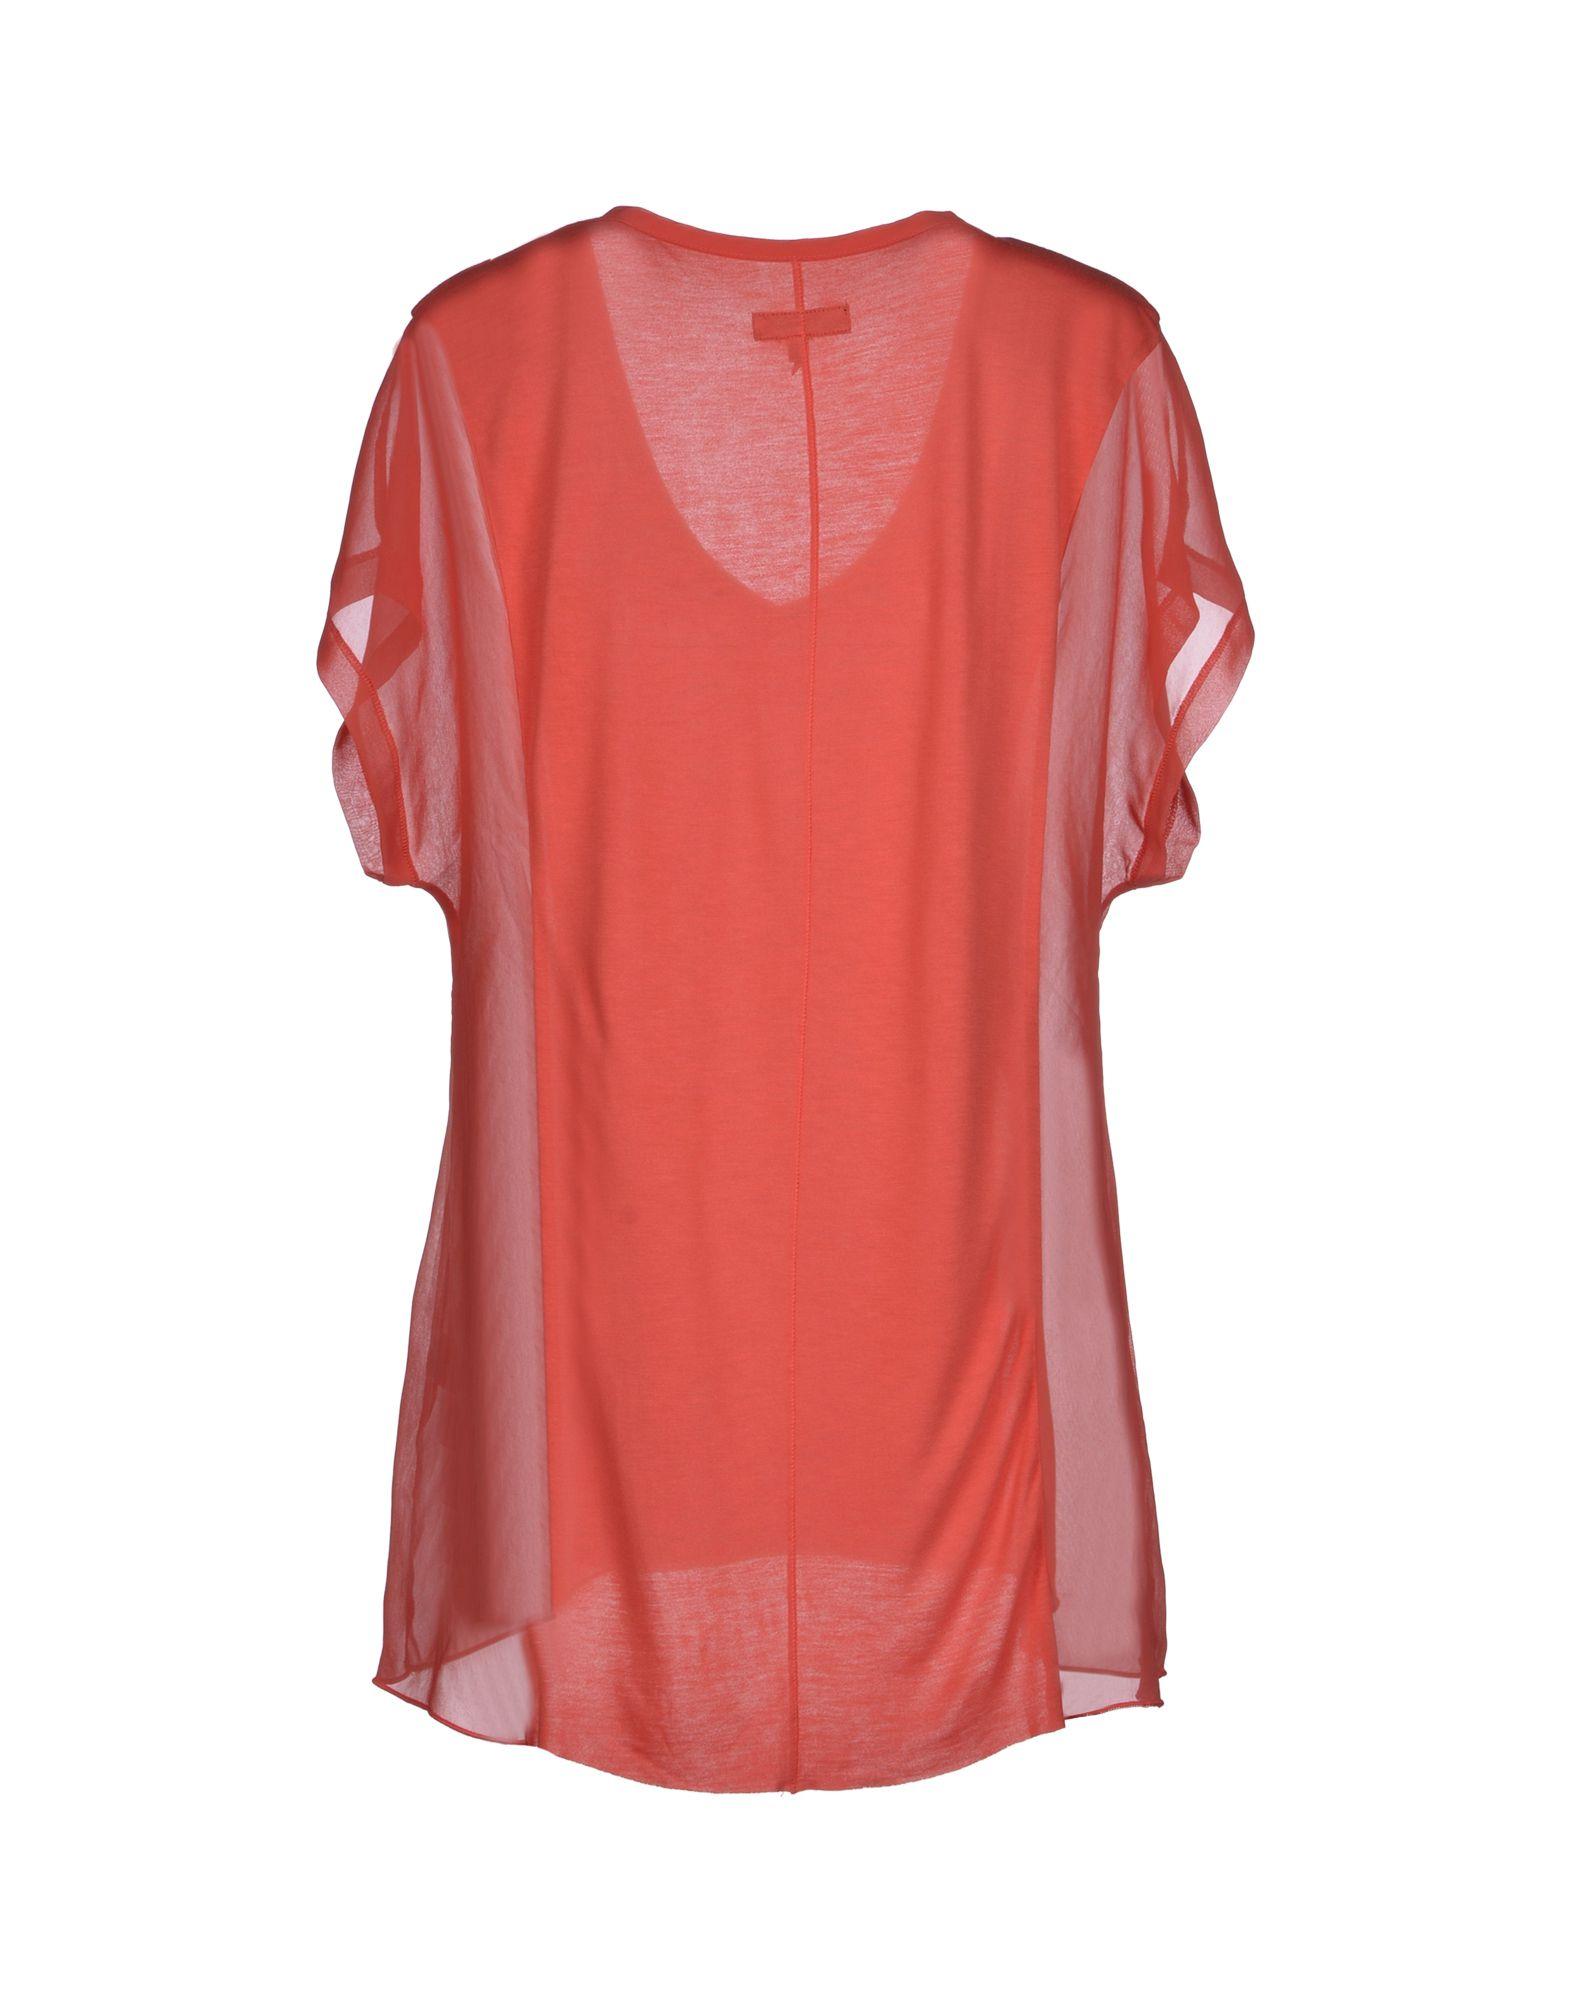 Rag Bone T Shirt In Red Coral Lyst